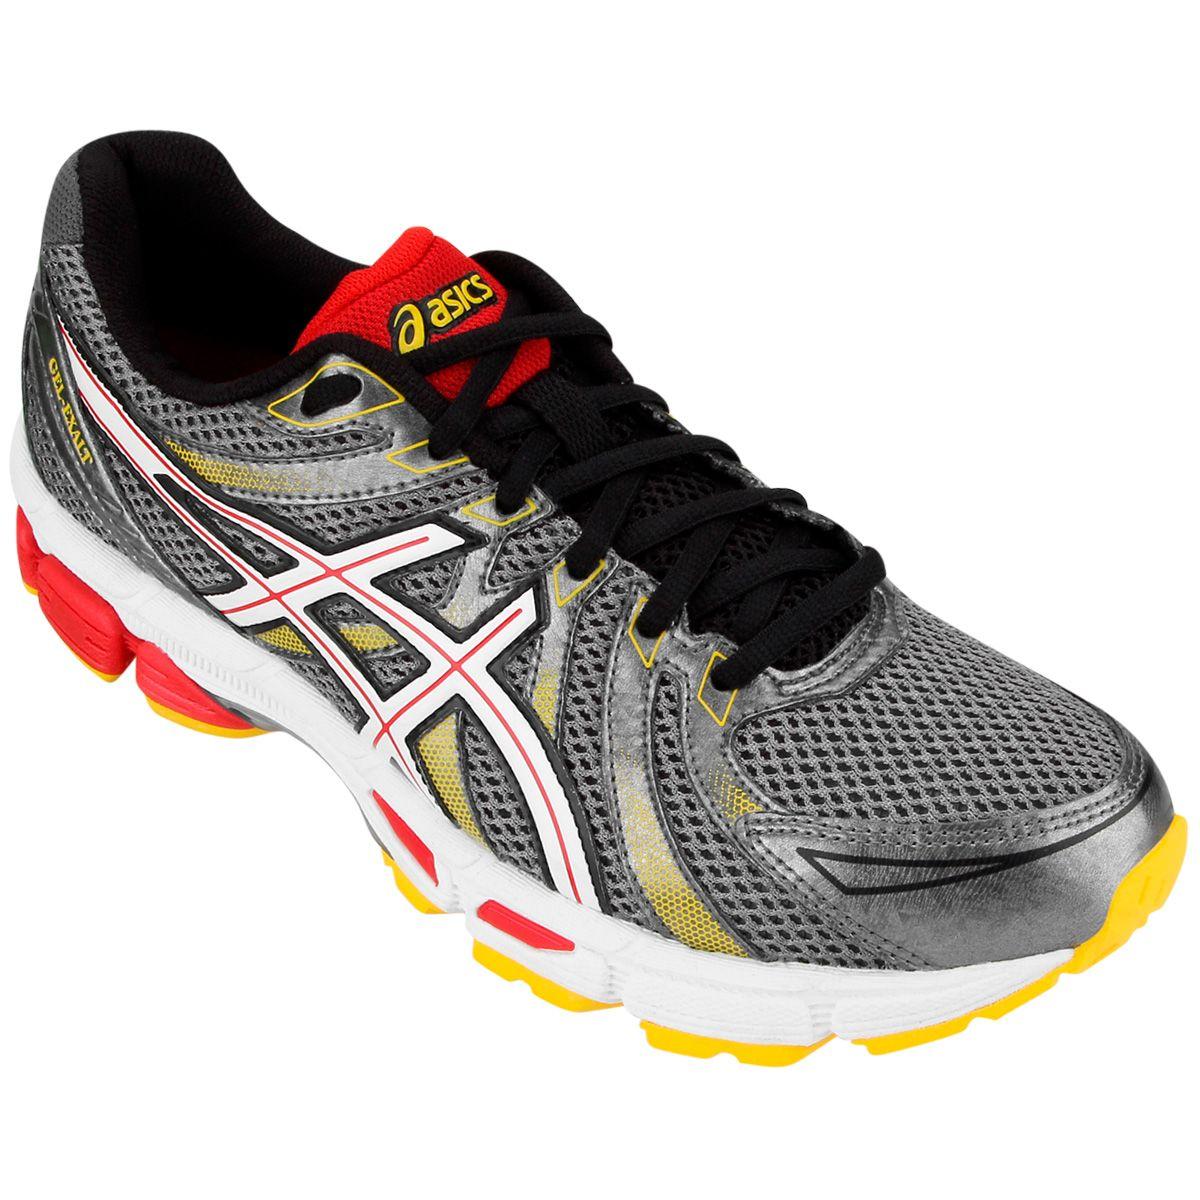 Netshoes - Tênis Asics Gel Exalt